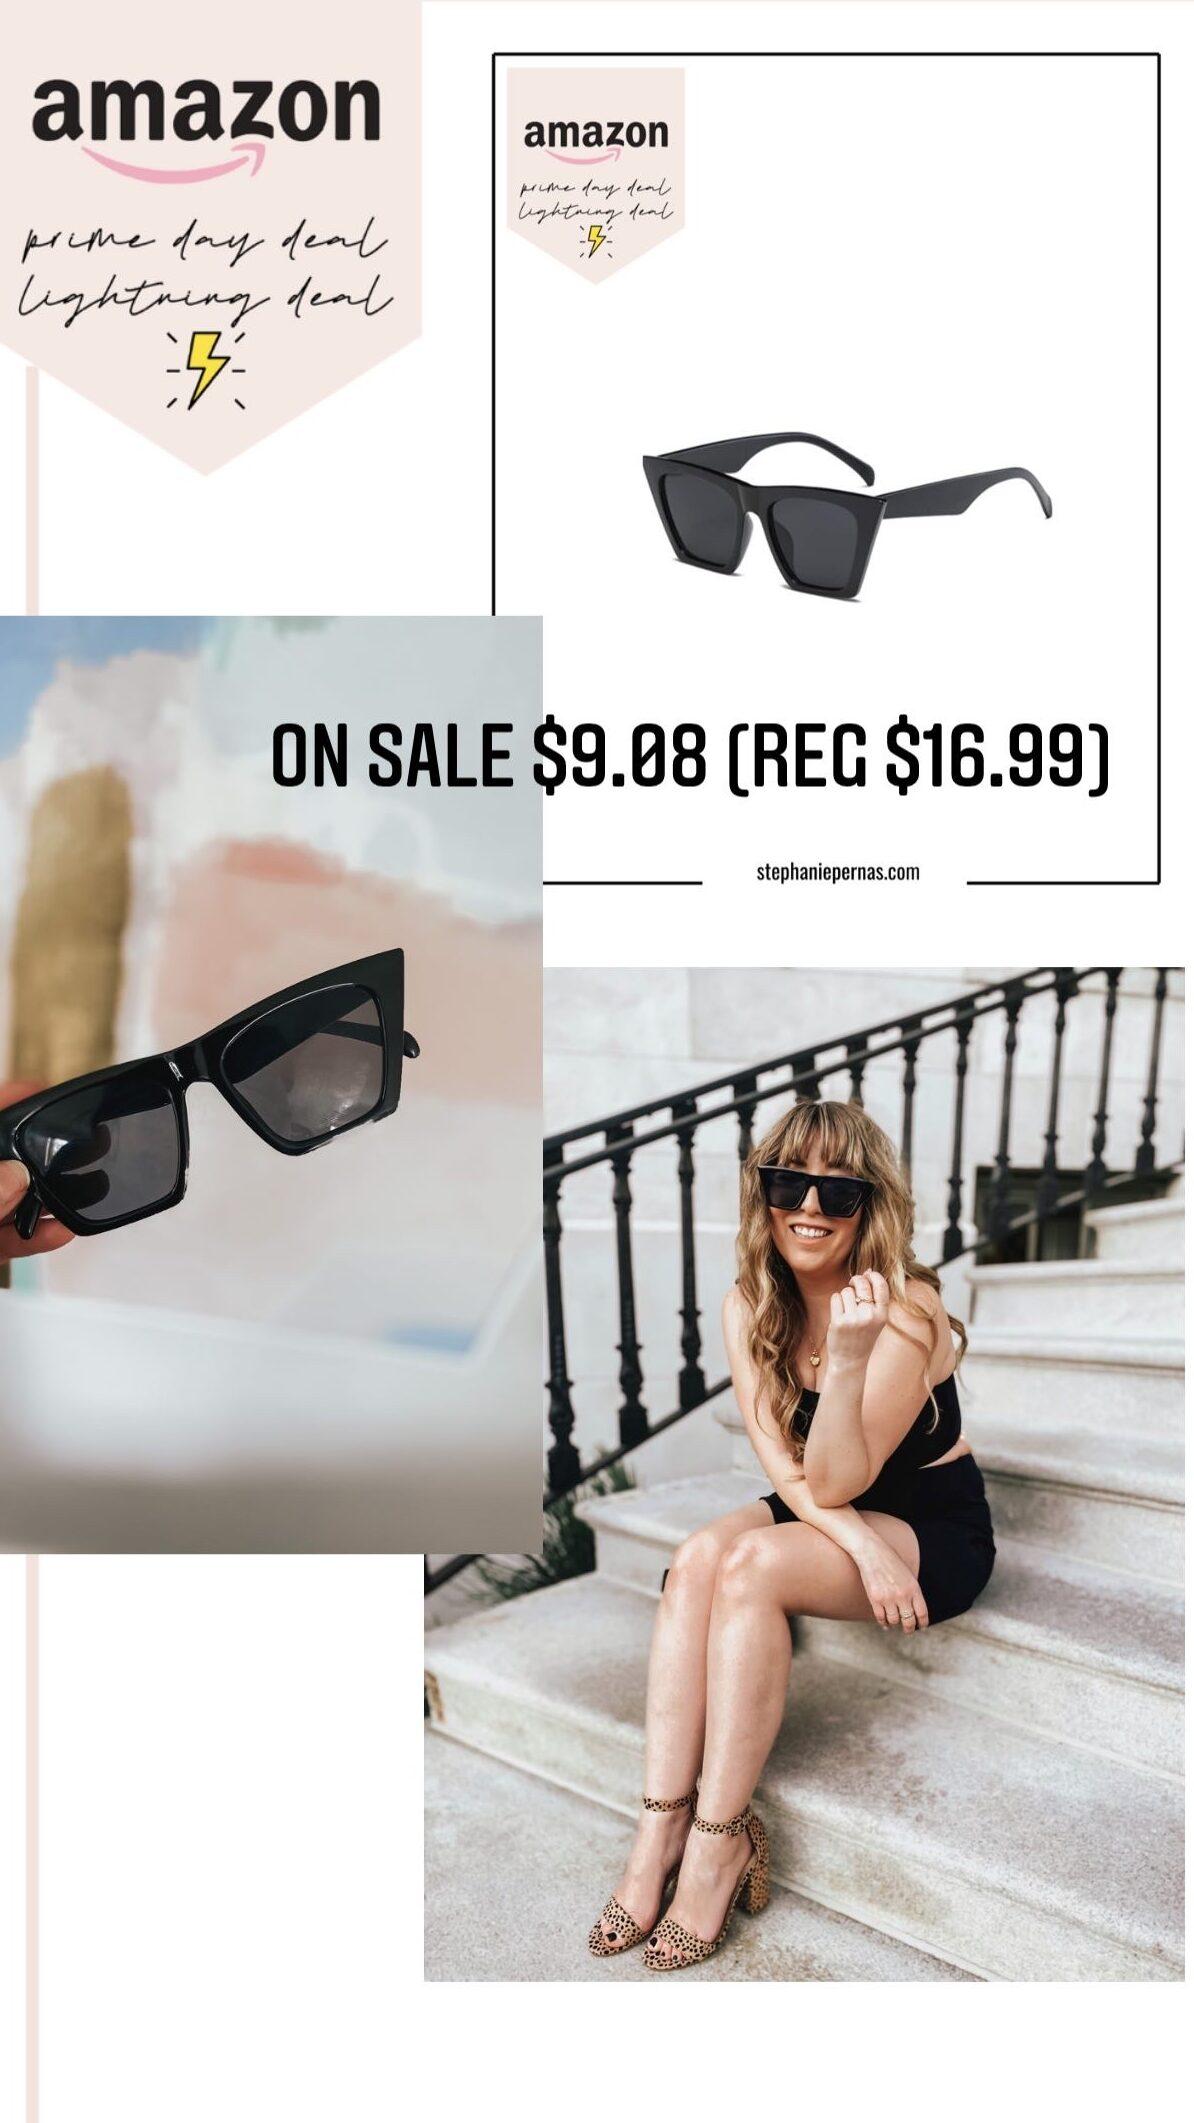 Amazon Prime Day Lightning Deals - Rectangular Sunglasses